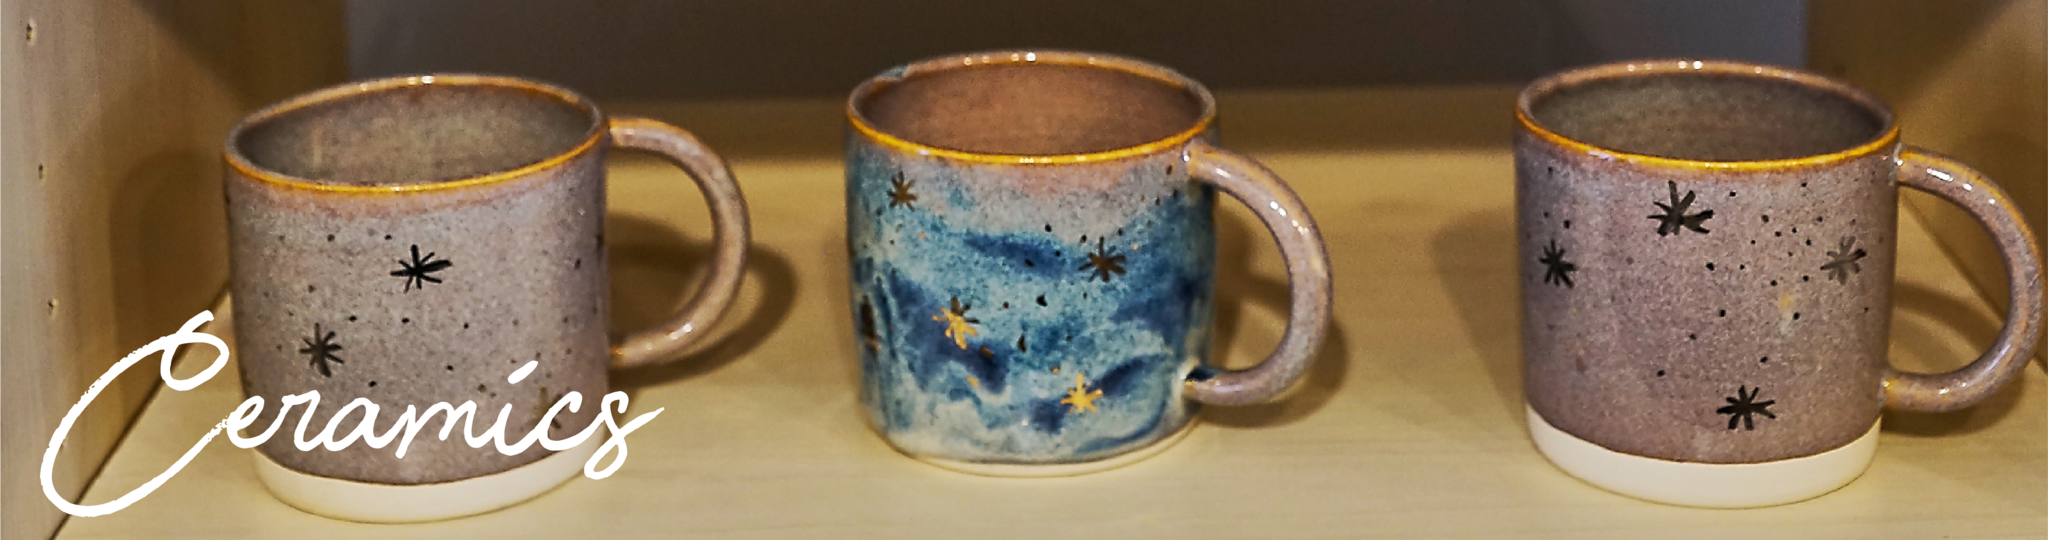 Page Ceramics